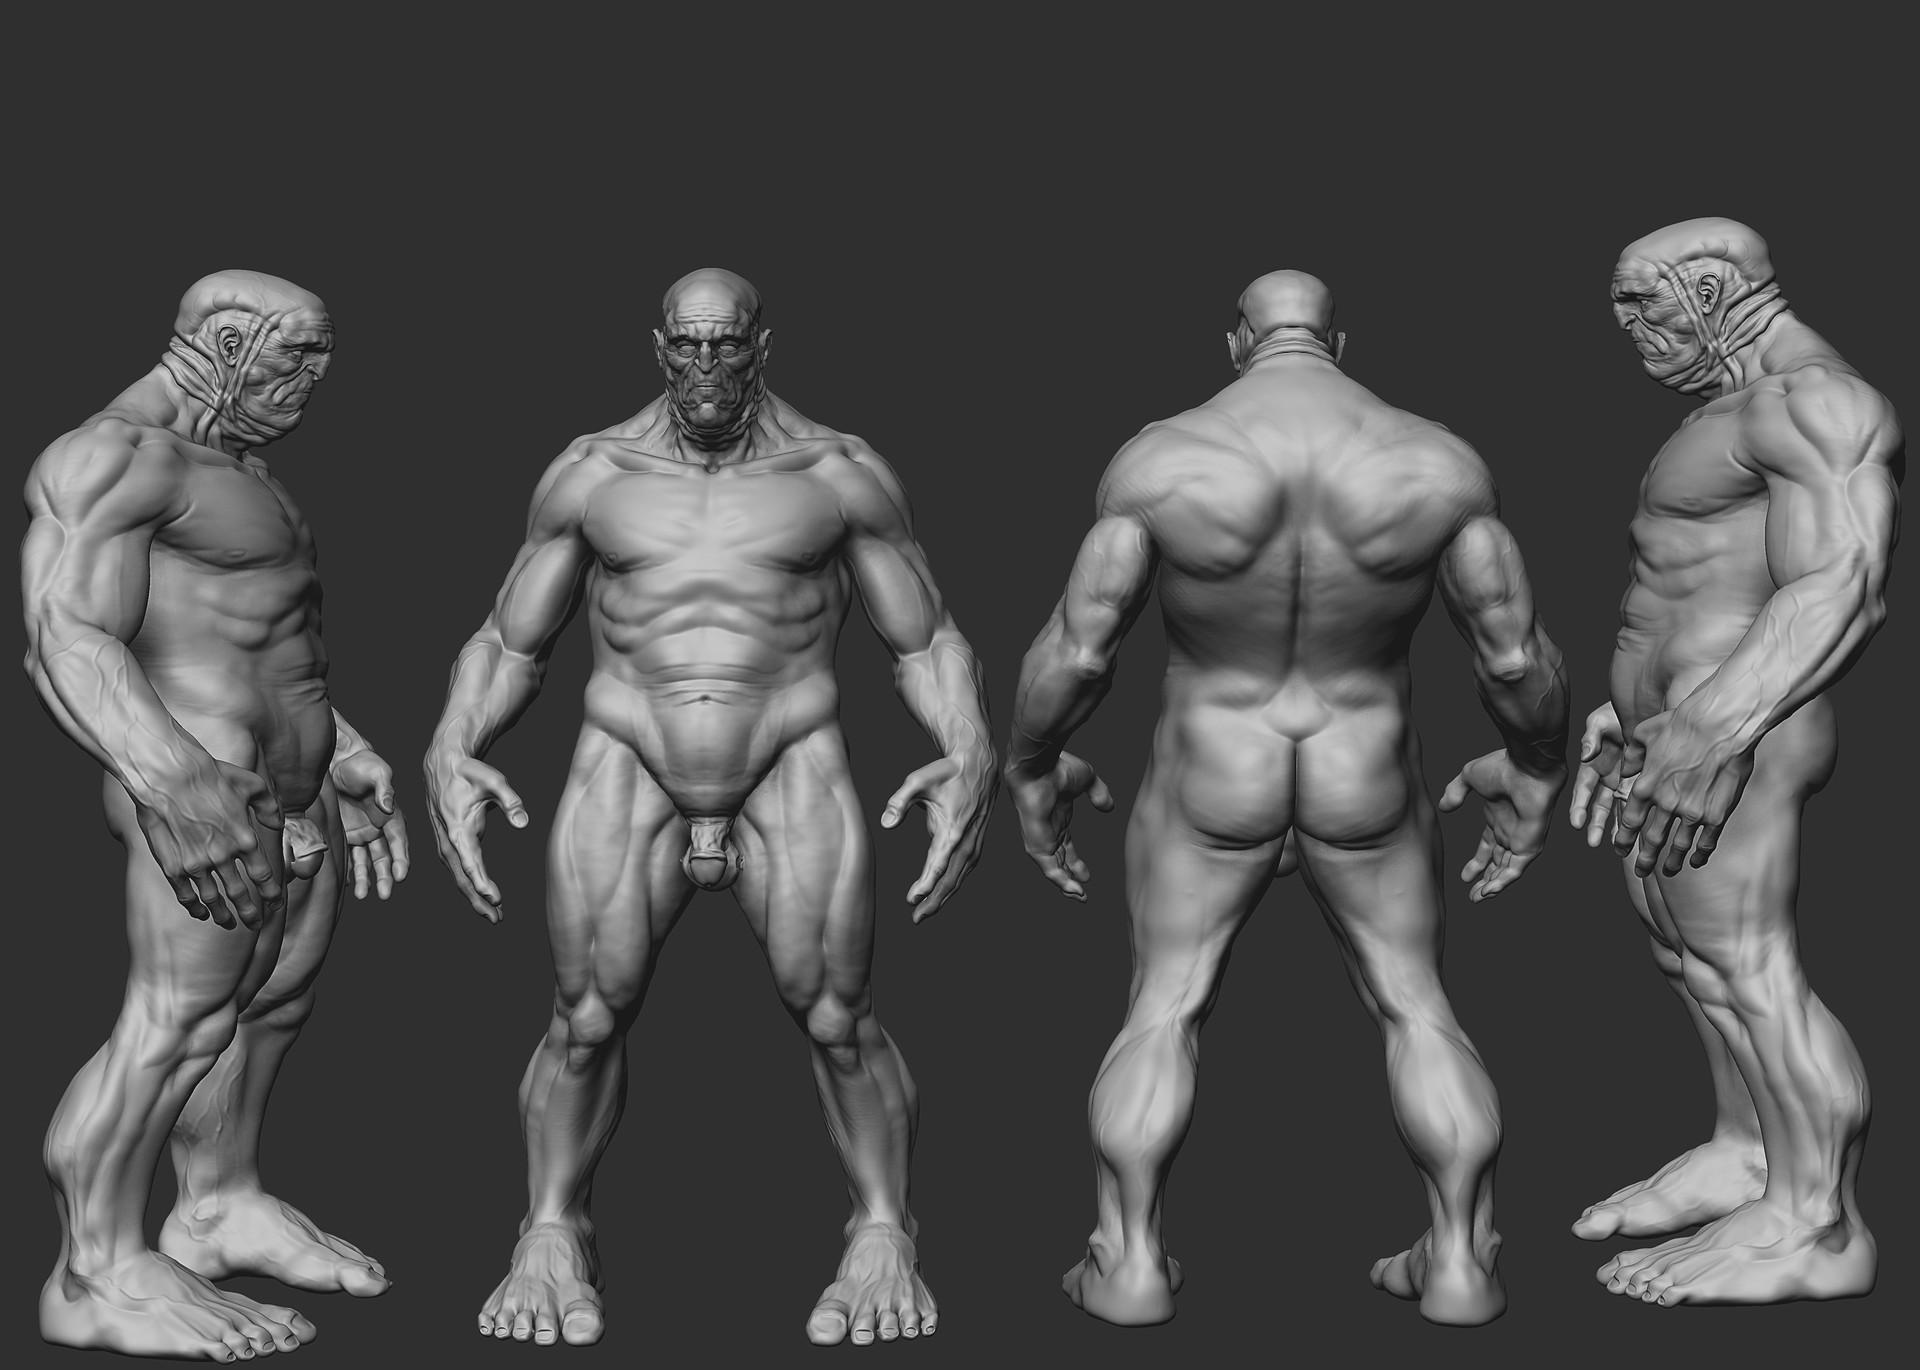 Fabricio rezende anatomy 3 detail